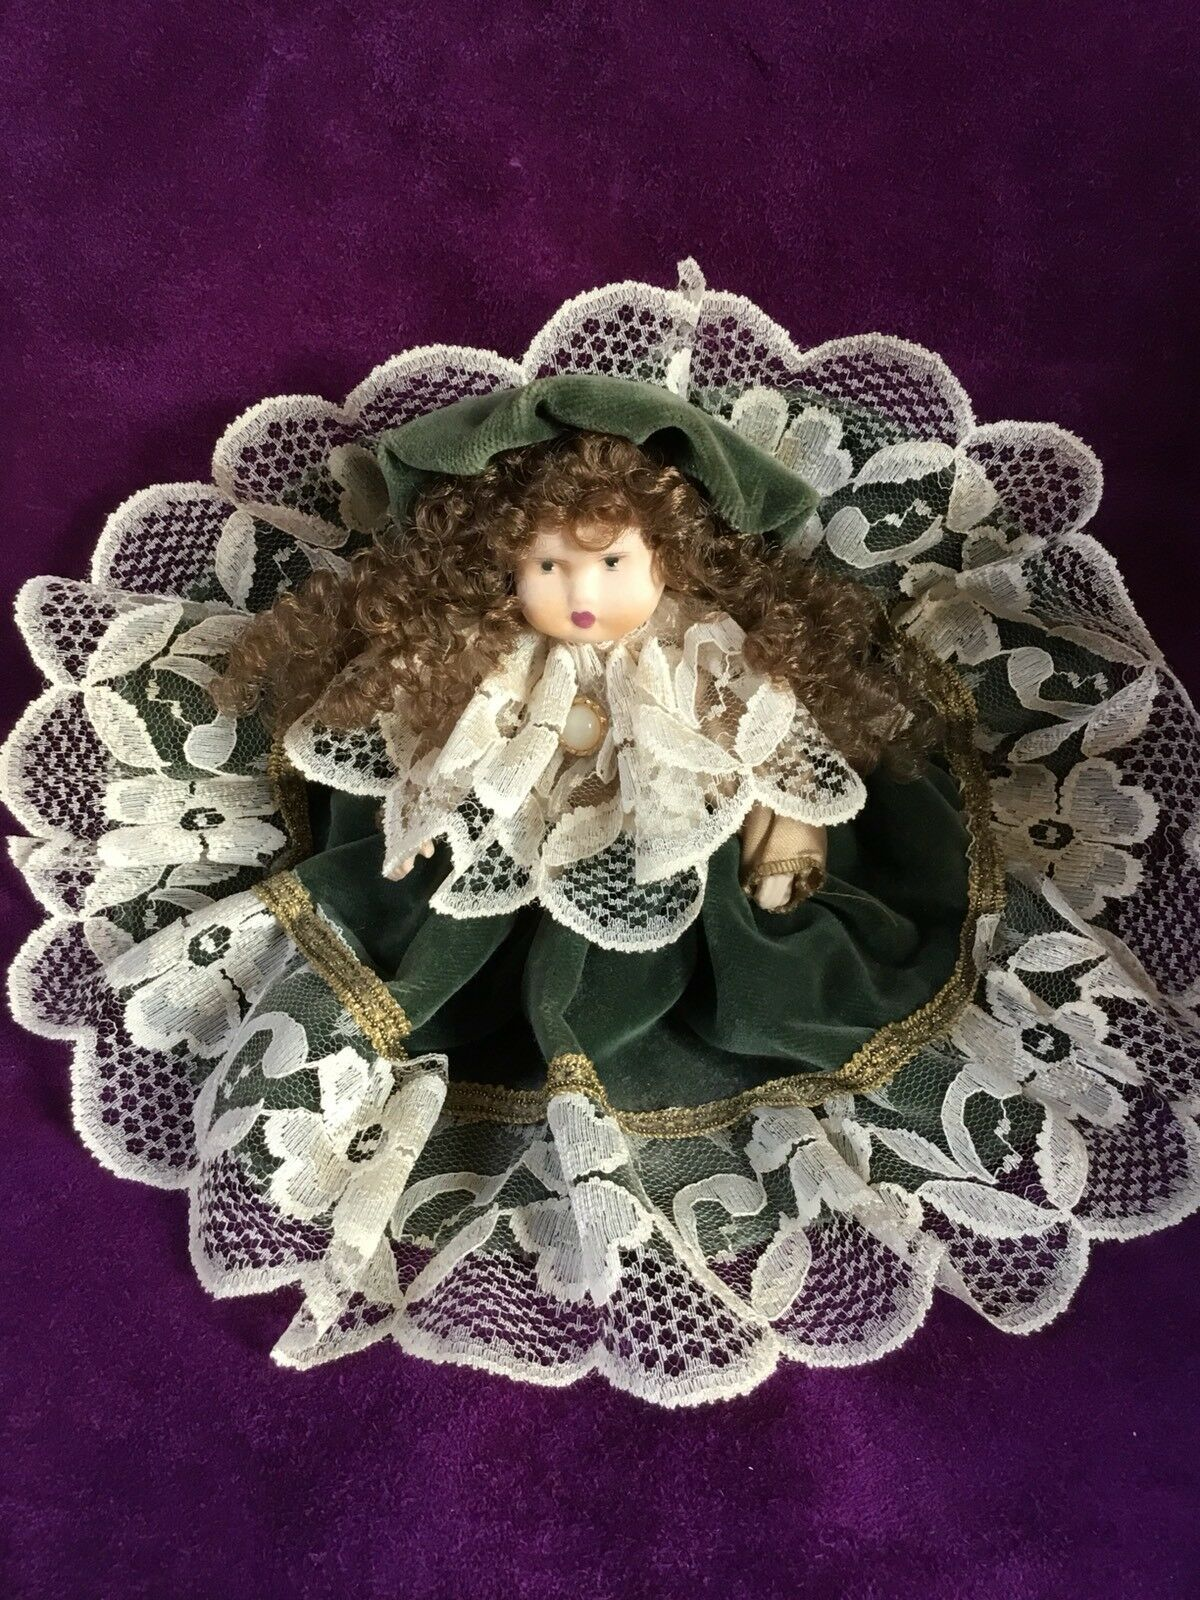 Bambola Porcellana Old Biscuit Doll Faenza Claudia Focaccia 20 Cm.